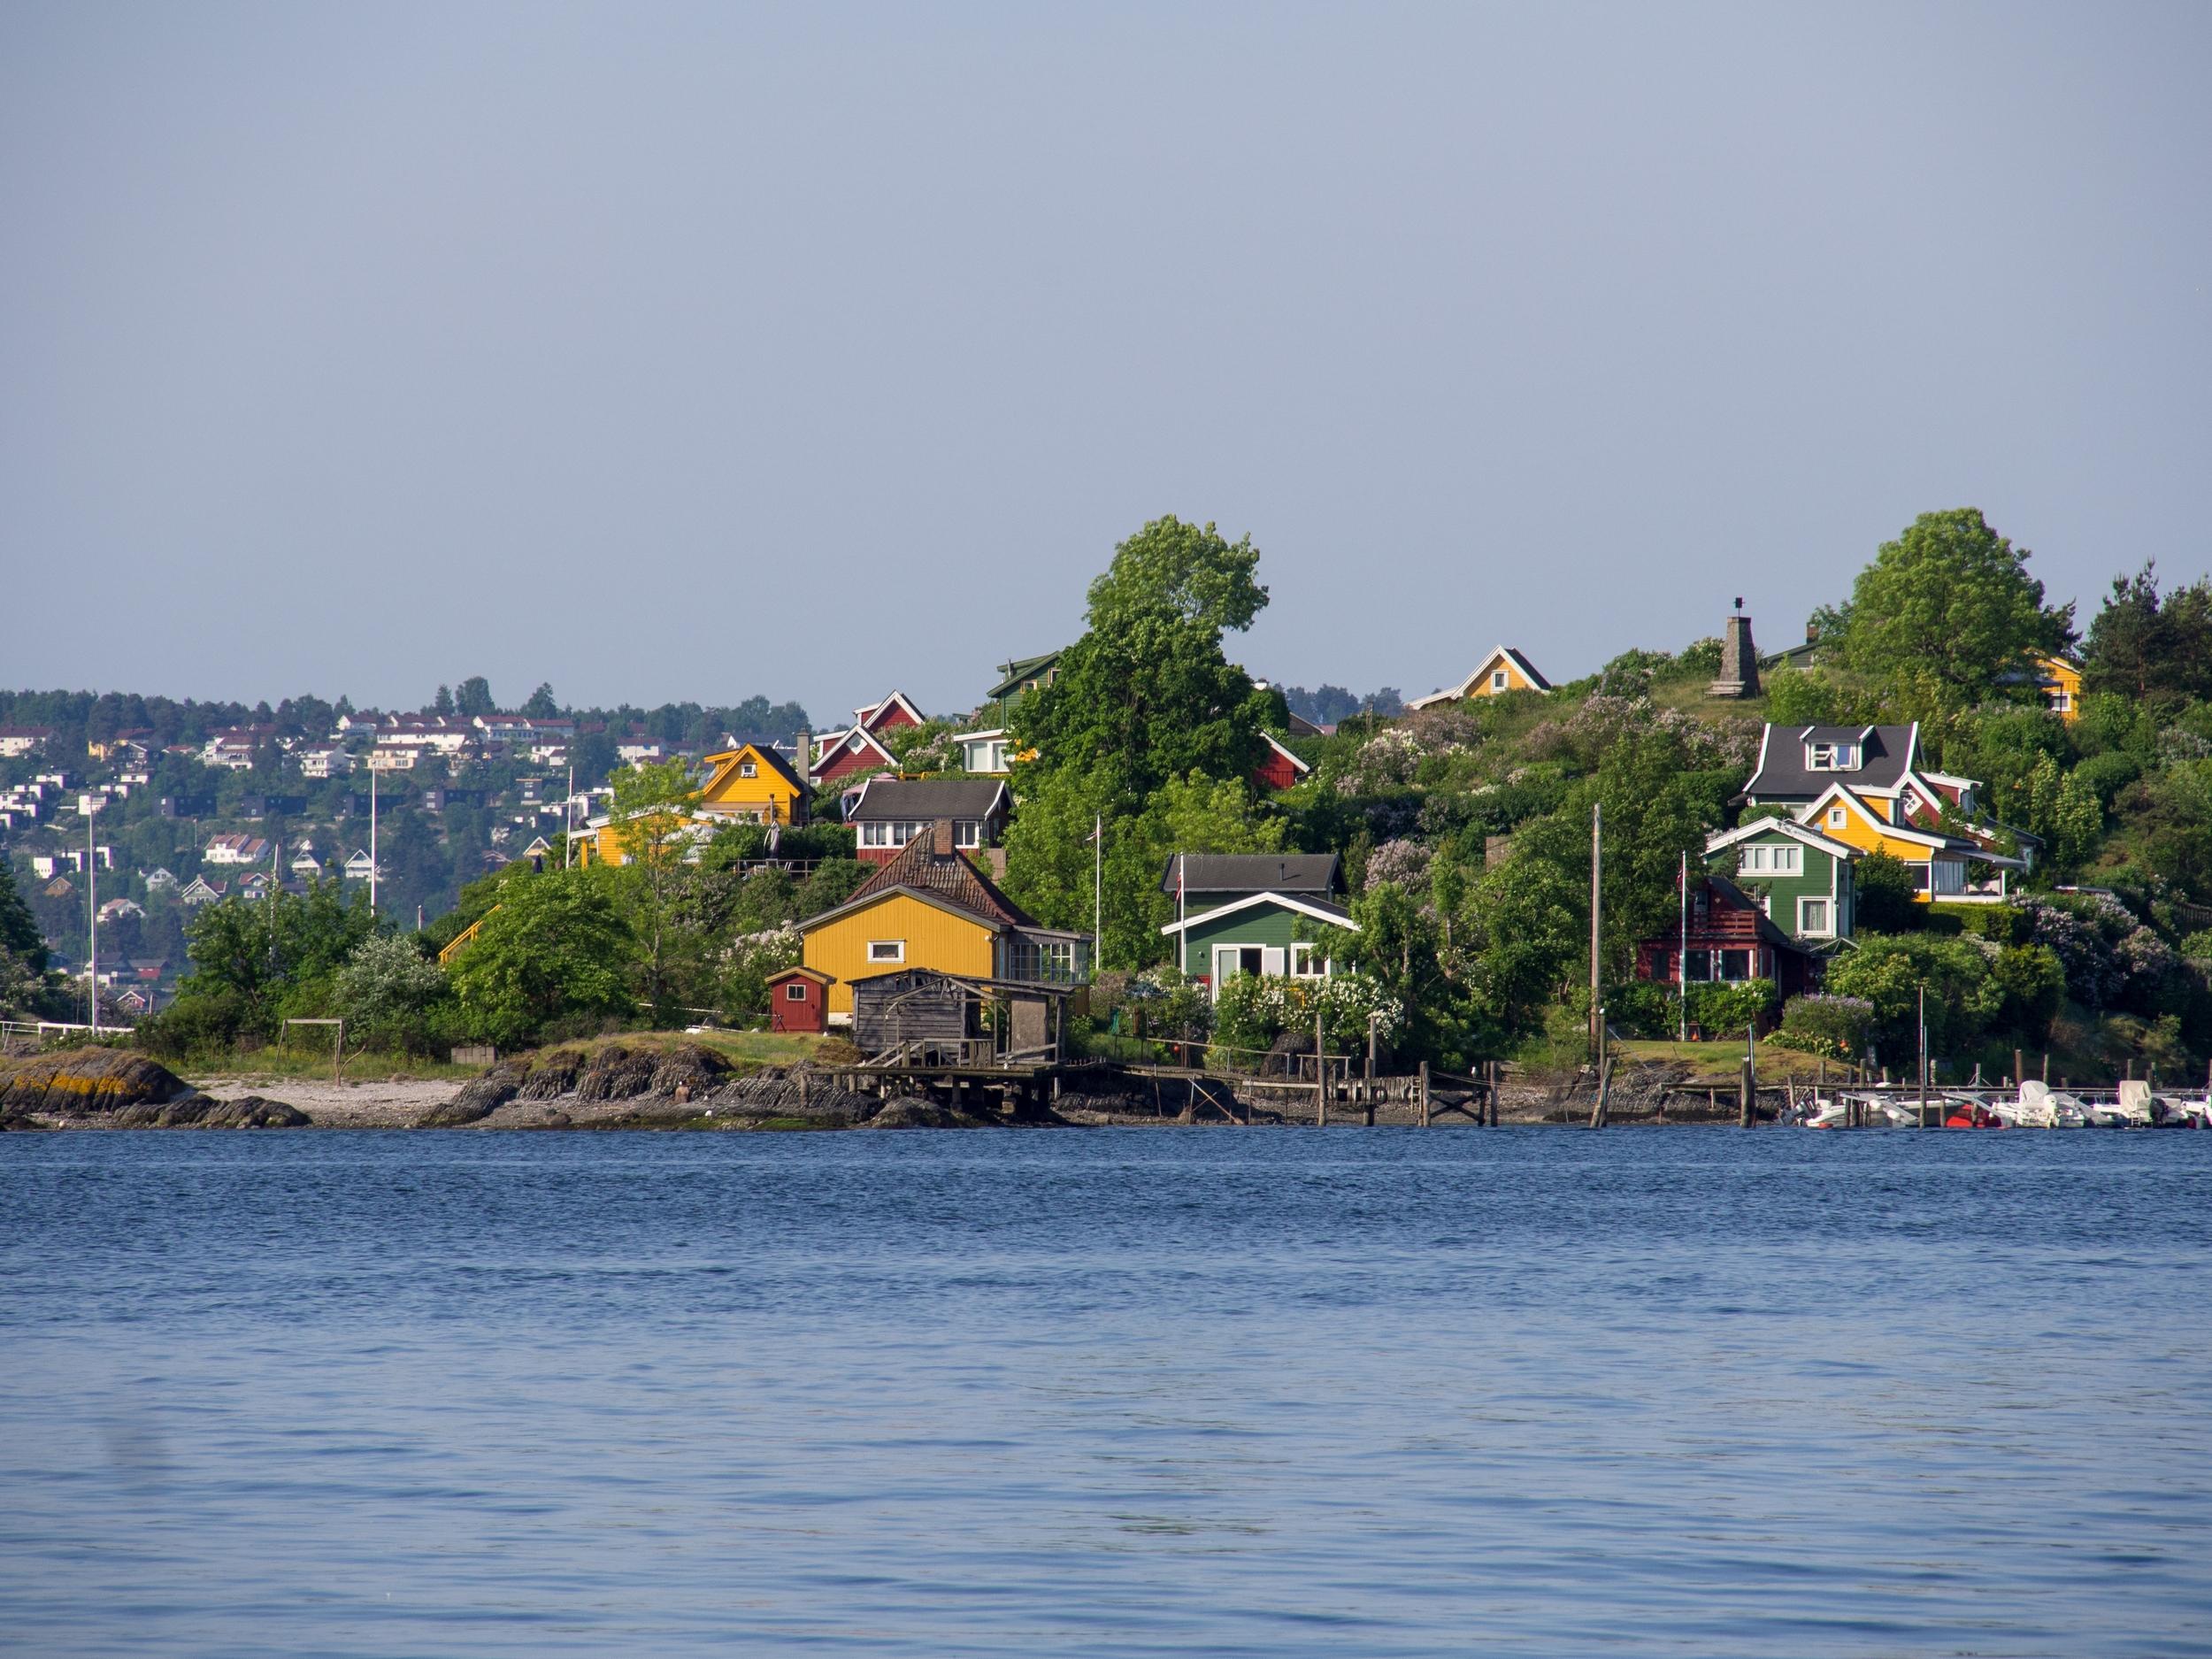 Wyspy na Oslofjorden